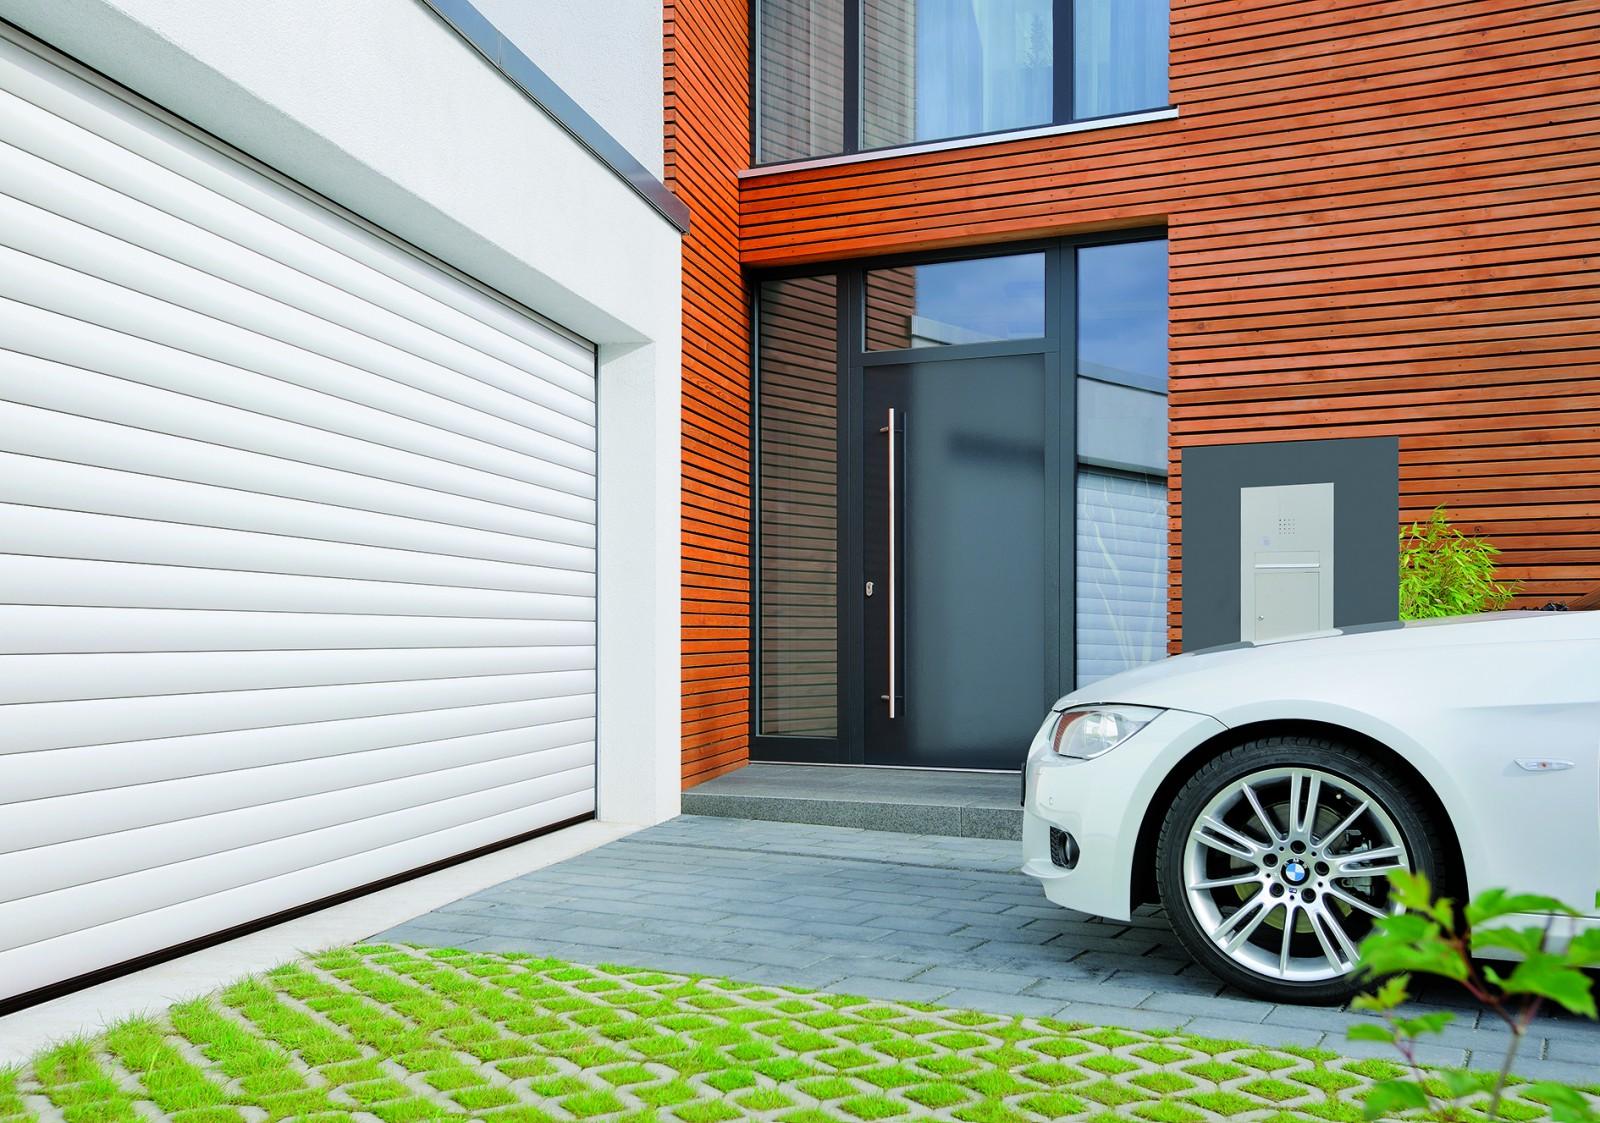 Porte garage enroulable motoris e for Volet de garage enroulable